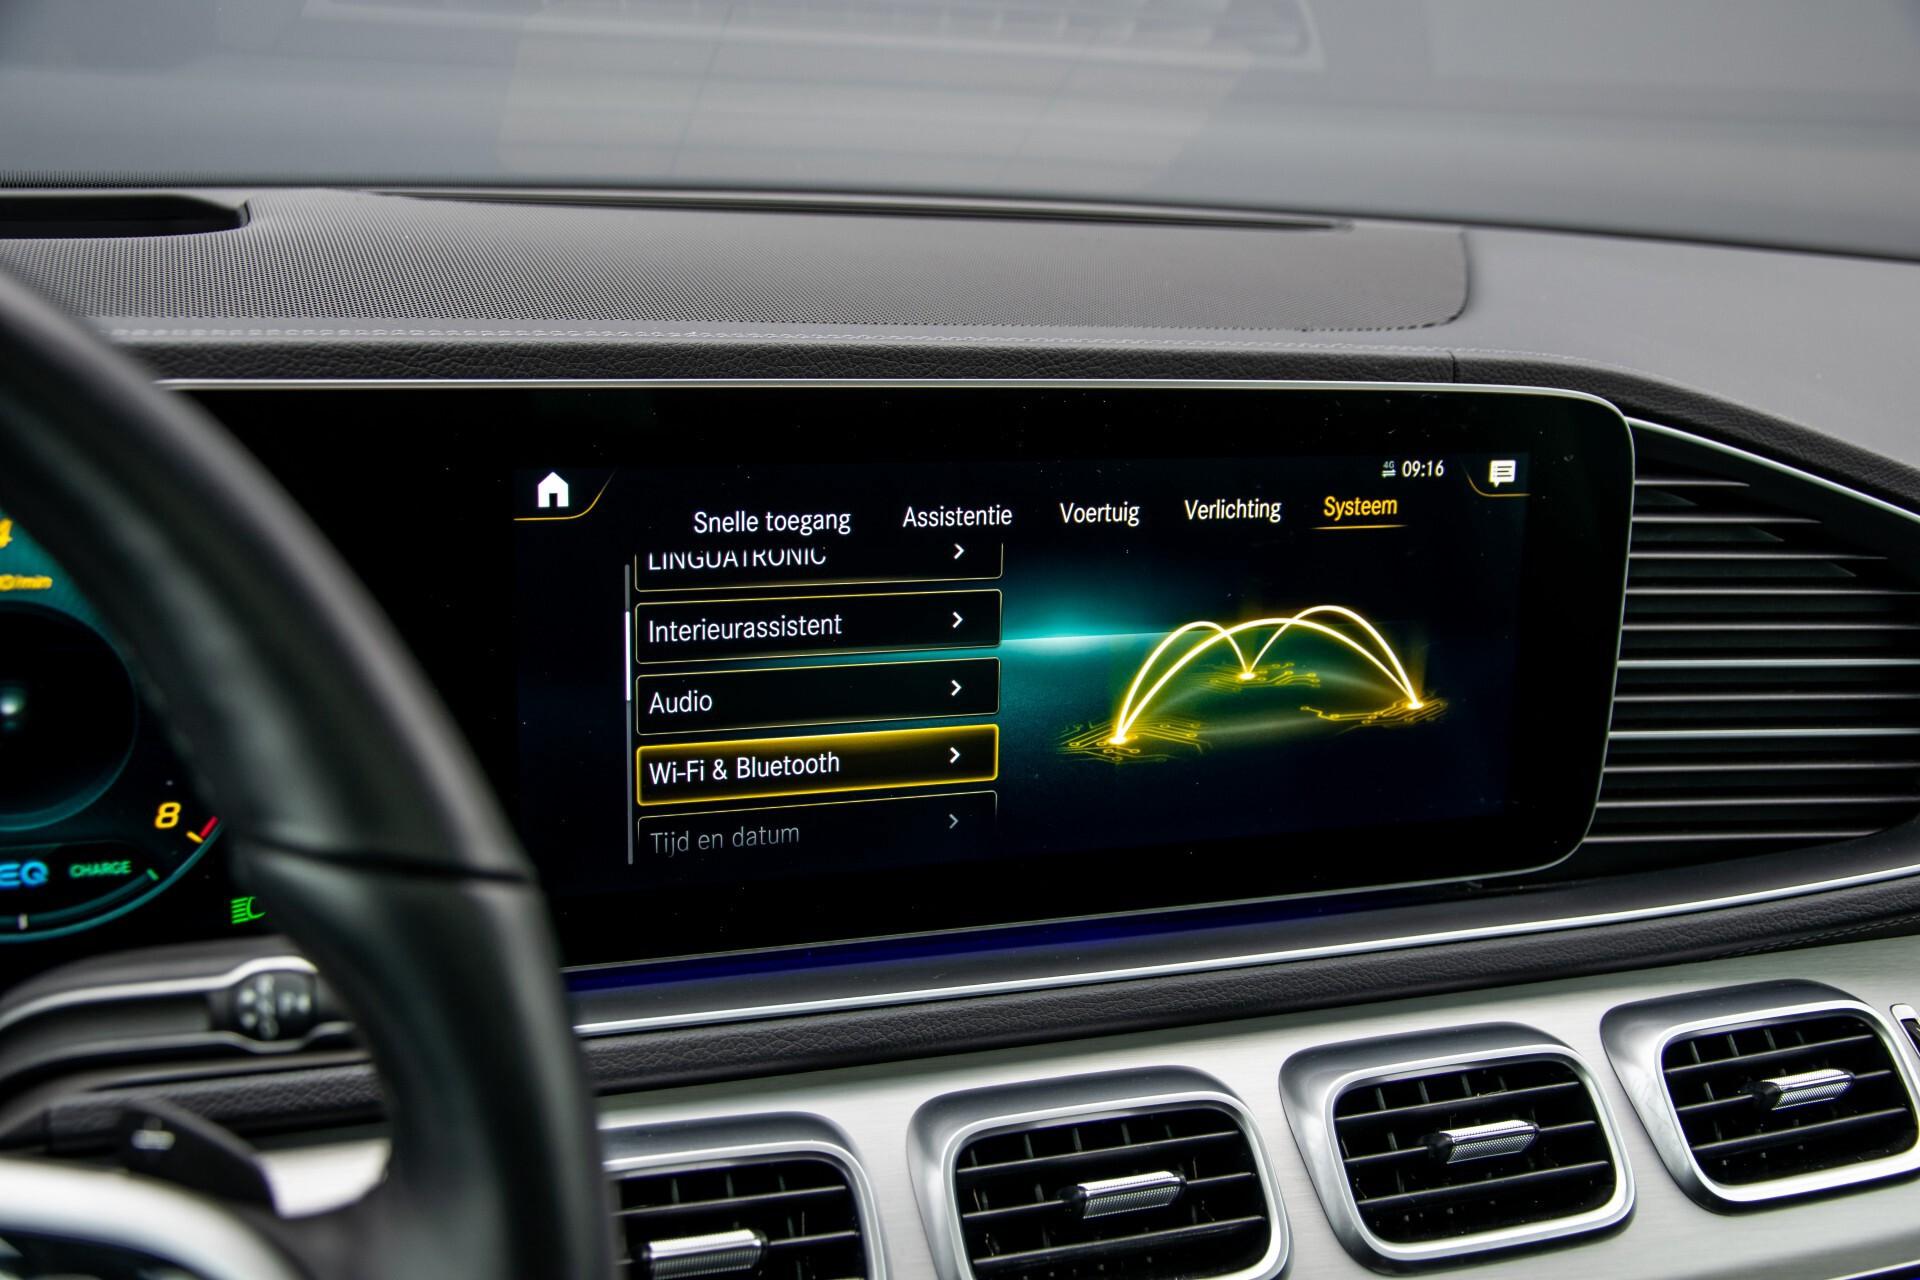 Mercedes-Benz GLE 450 4-M 7-Persoons AMG Massage/Rij-assist/Keyless/TV/360/Night/Trekhaak Aut9 Foto 56